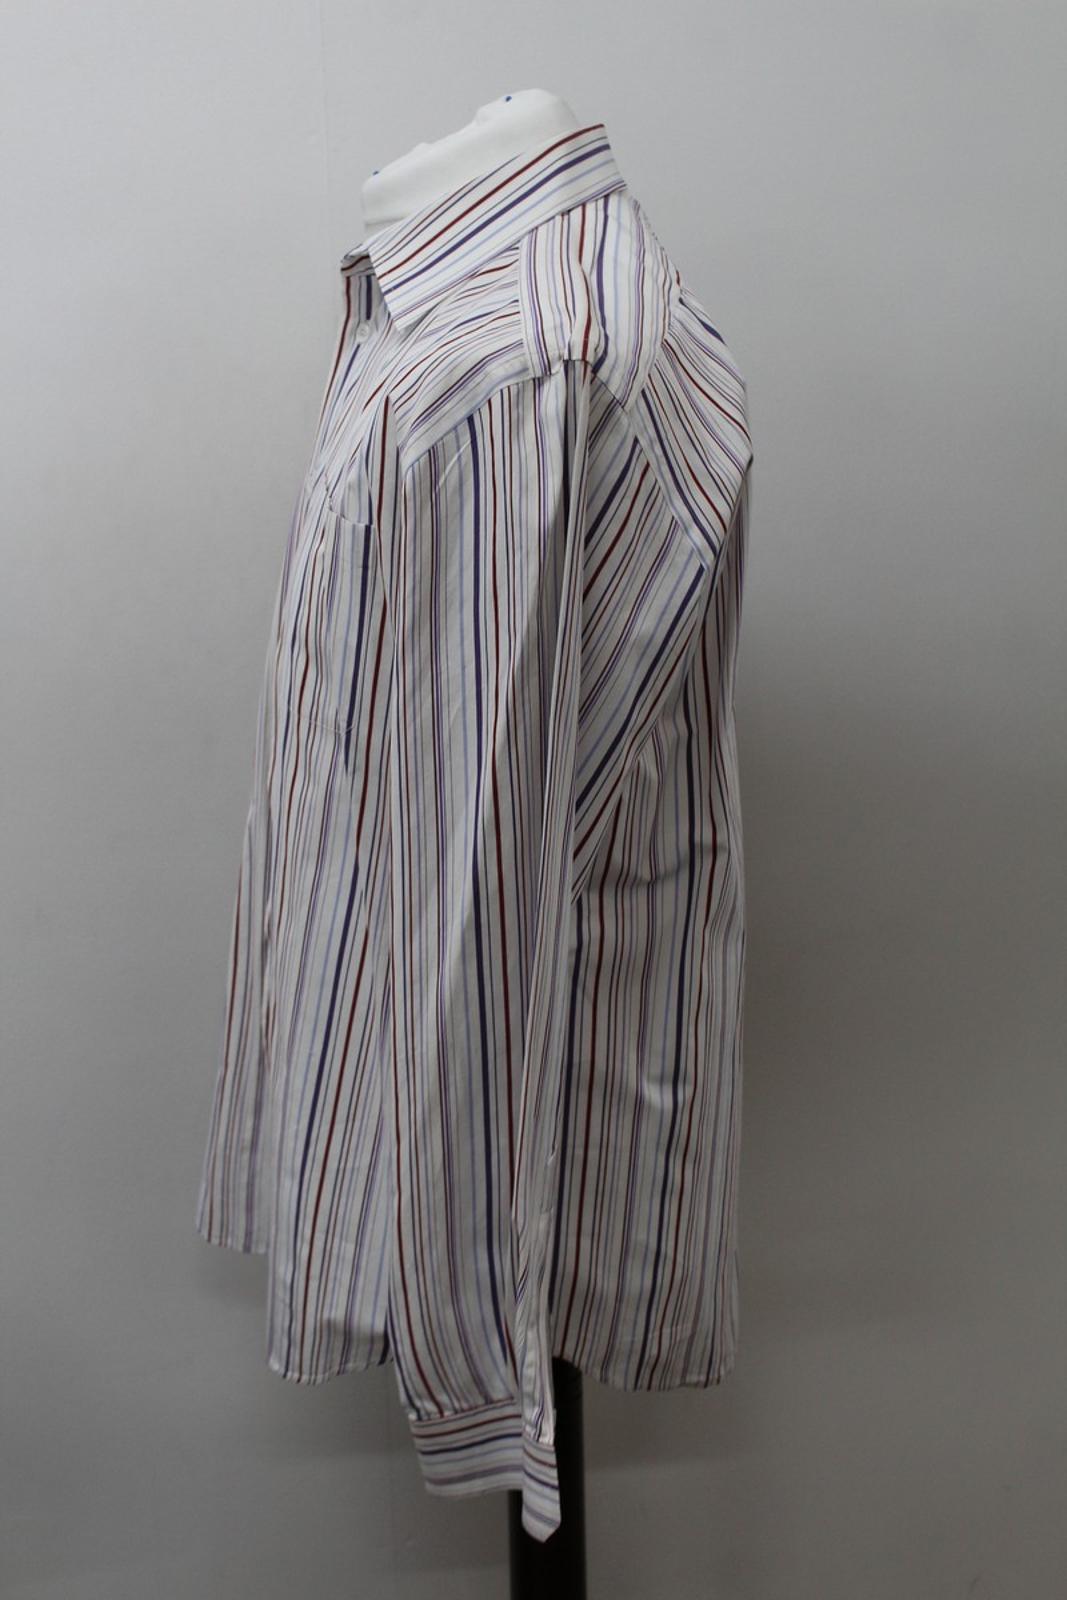 Hermes-para-hombre-Multi-Color-a-rayas-de-algodon-camisa-de-mangas-largas-cuello-16-5-034-42cm miniatura 6